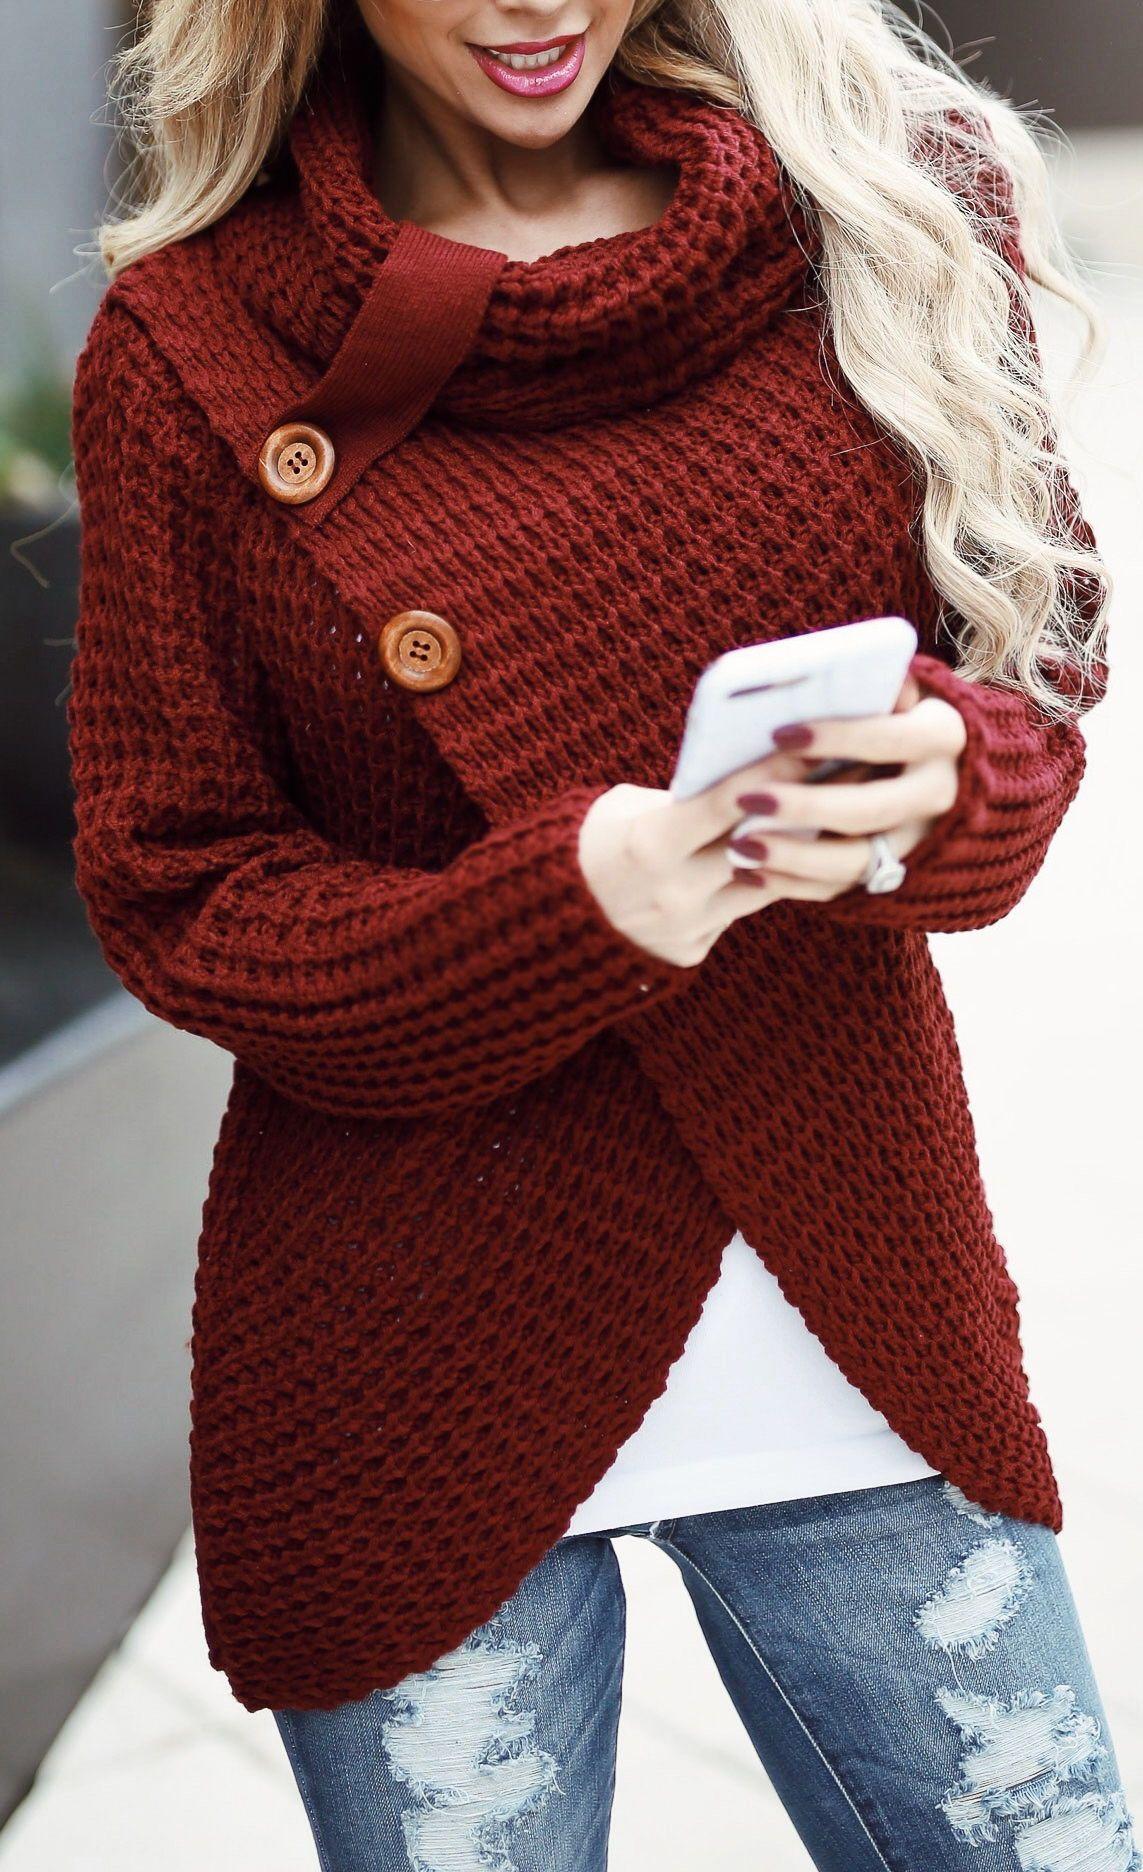 af7de23b54  42.99 Chicnico Casual Long Sleeve Front Cross Sweater